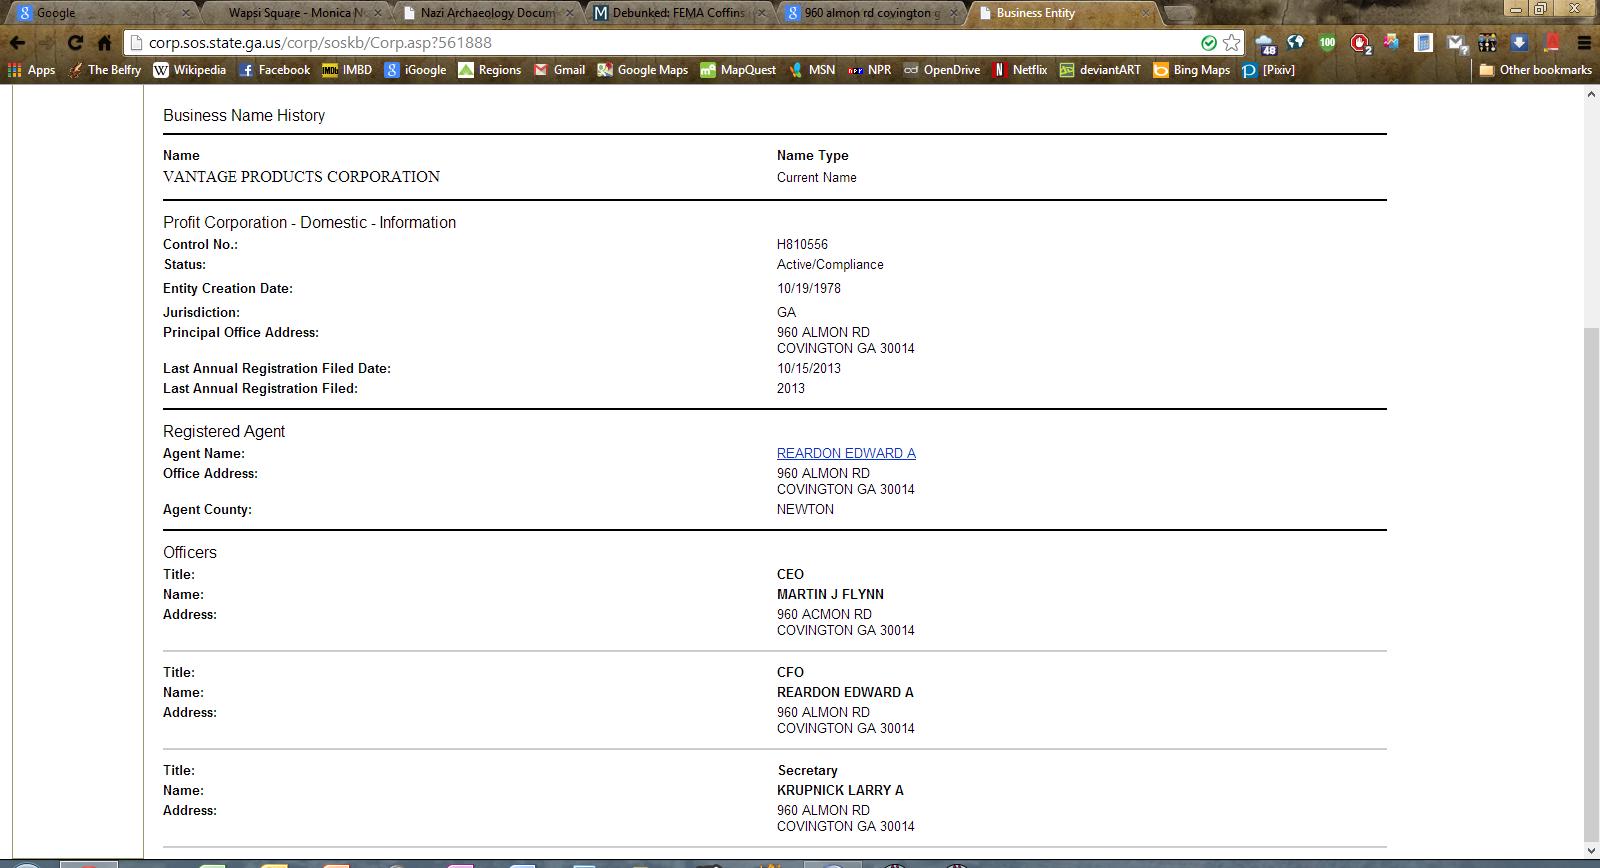 Vantage Prducts Corp Registration.PNG